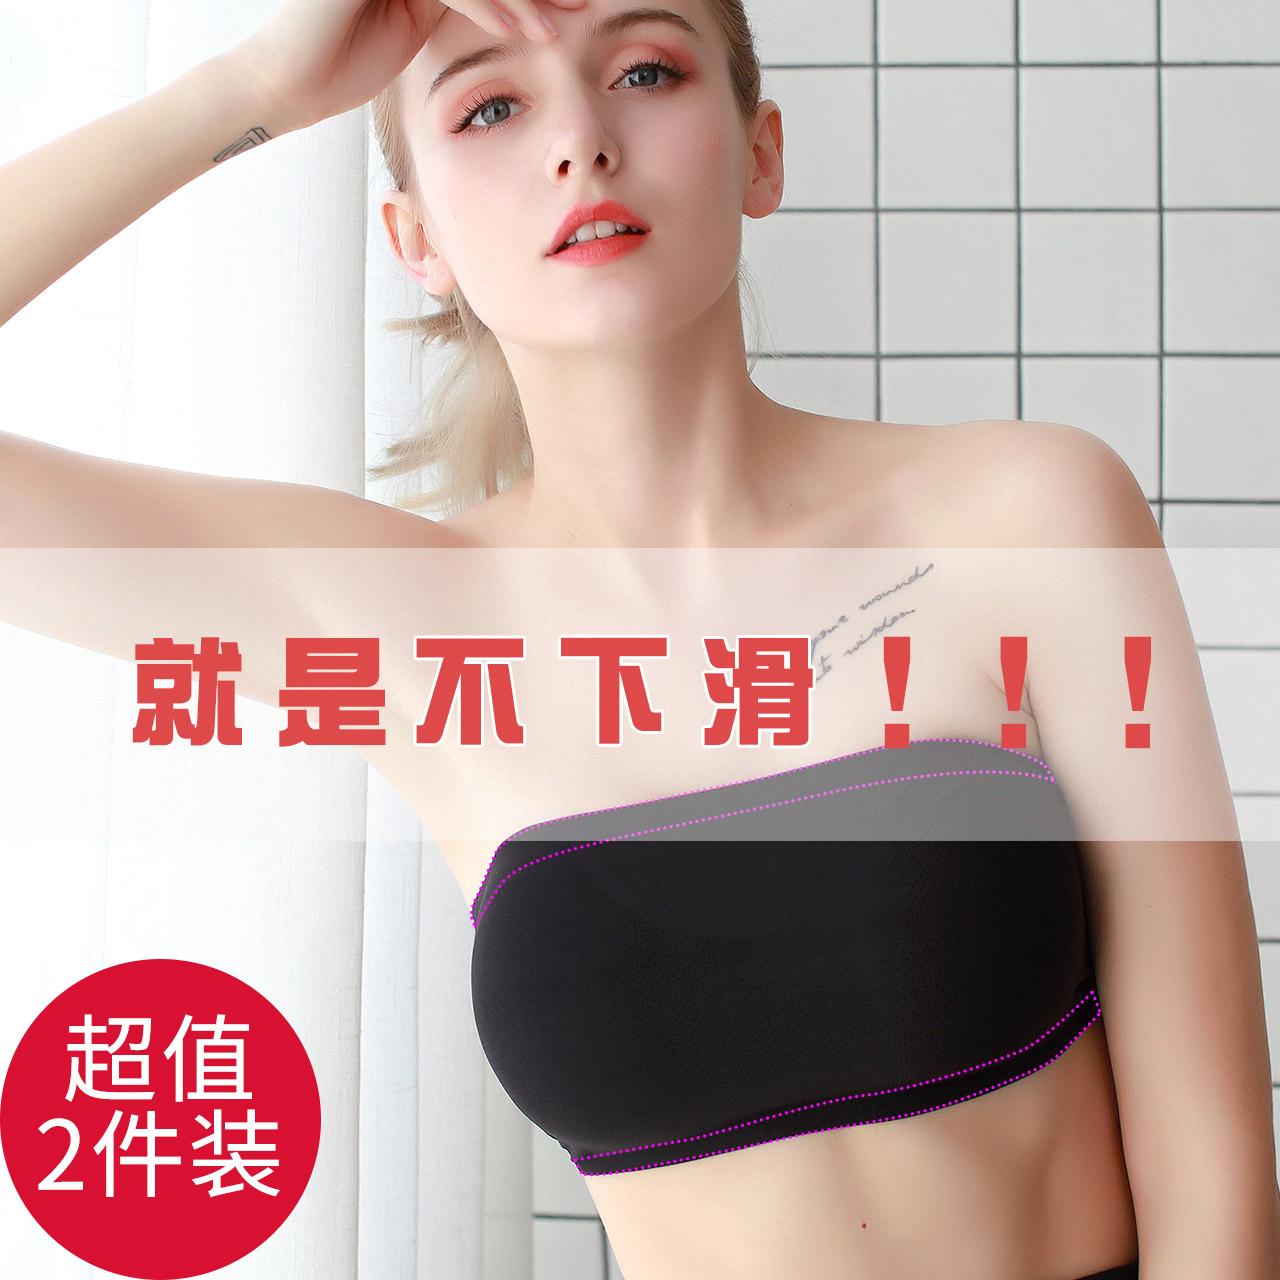 b1fb314d21 Ice silk strapless bra underwear bra top anti light gather wrapped chest  short sexy touch jpg